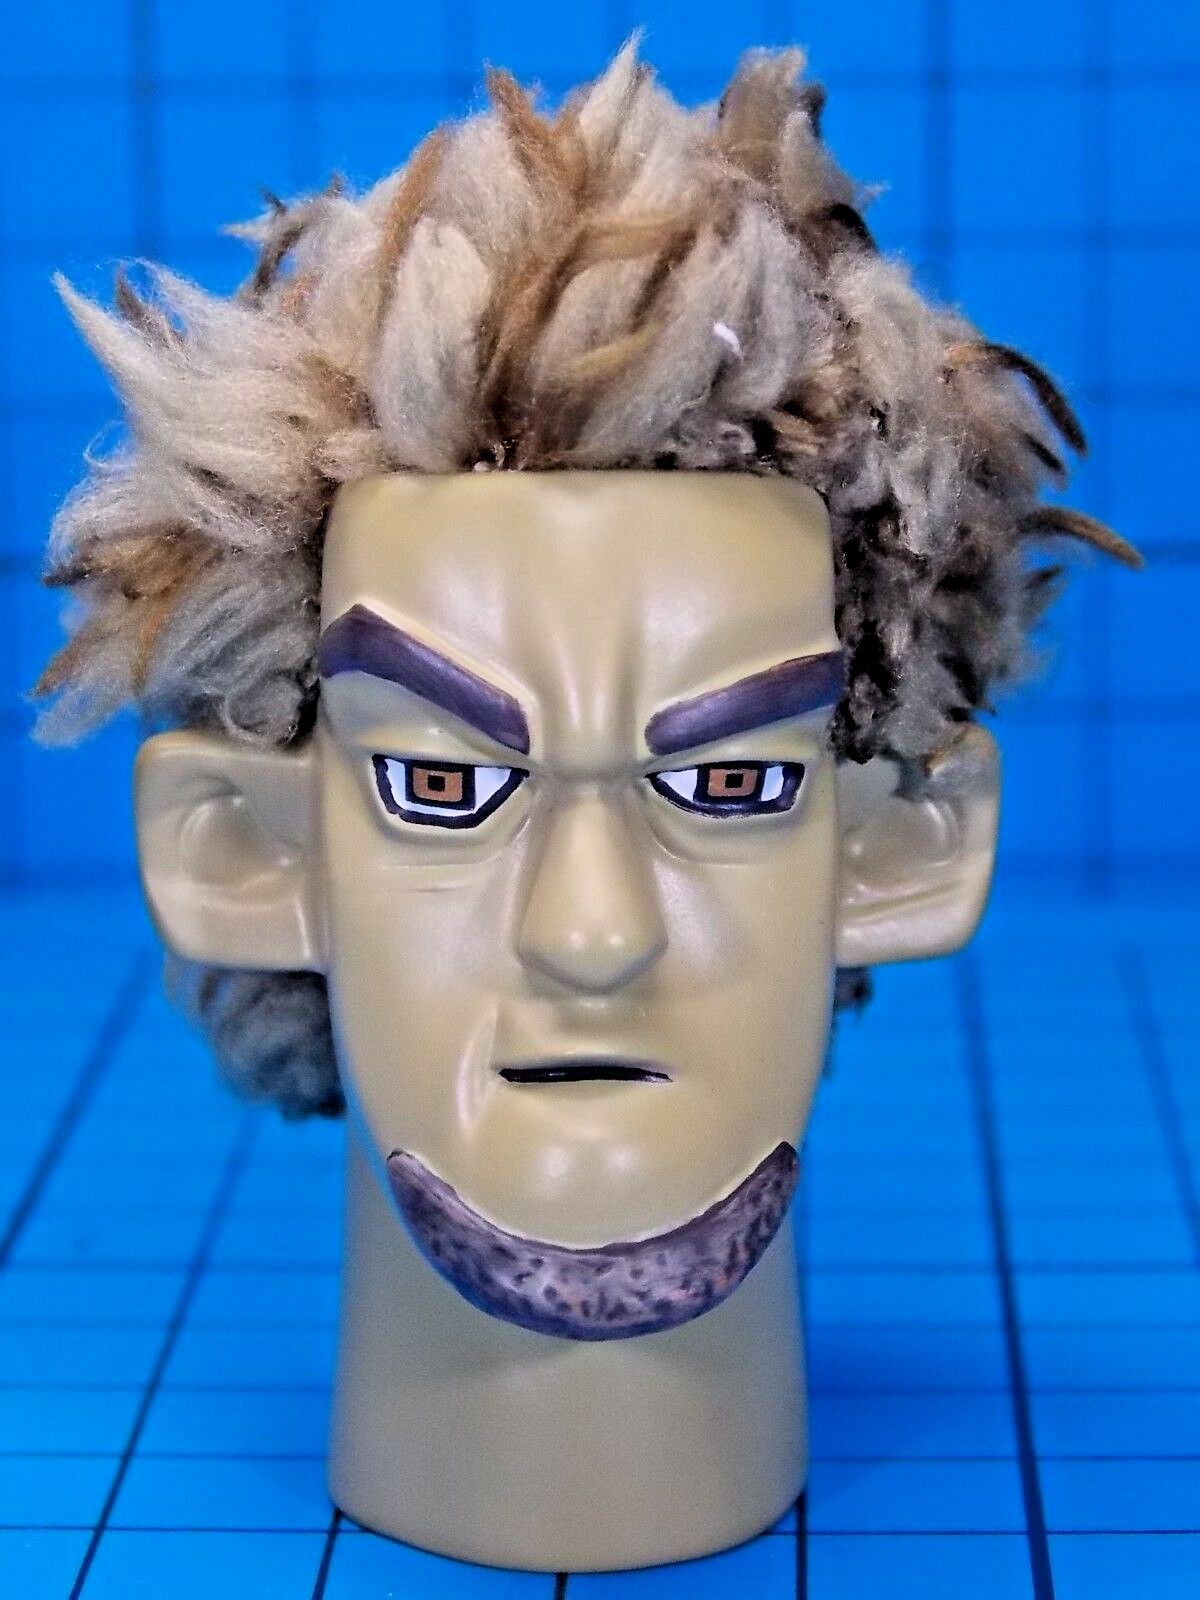 ACI x Jason Siu 1 6 Primates In Concrete Jungle Figure - Brad Head Sculpt